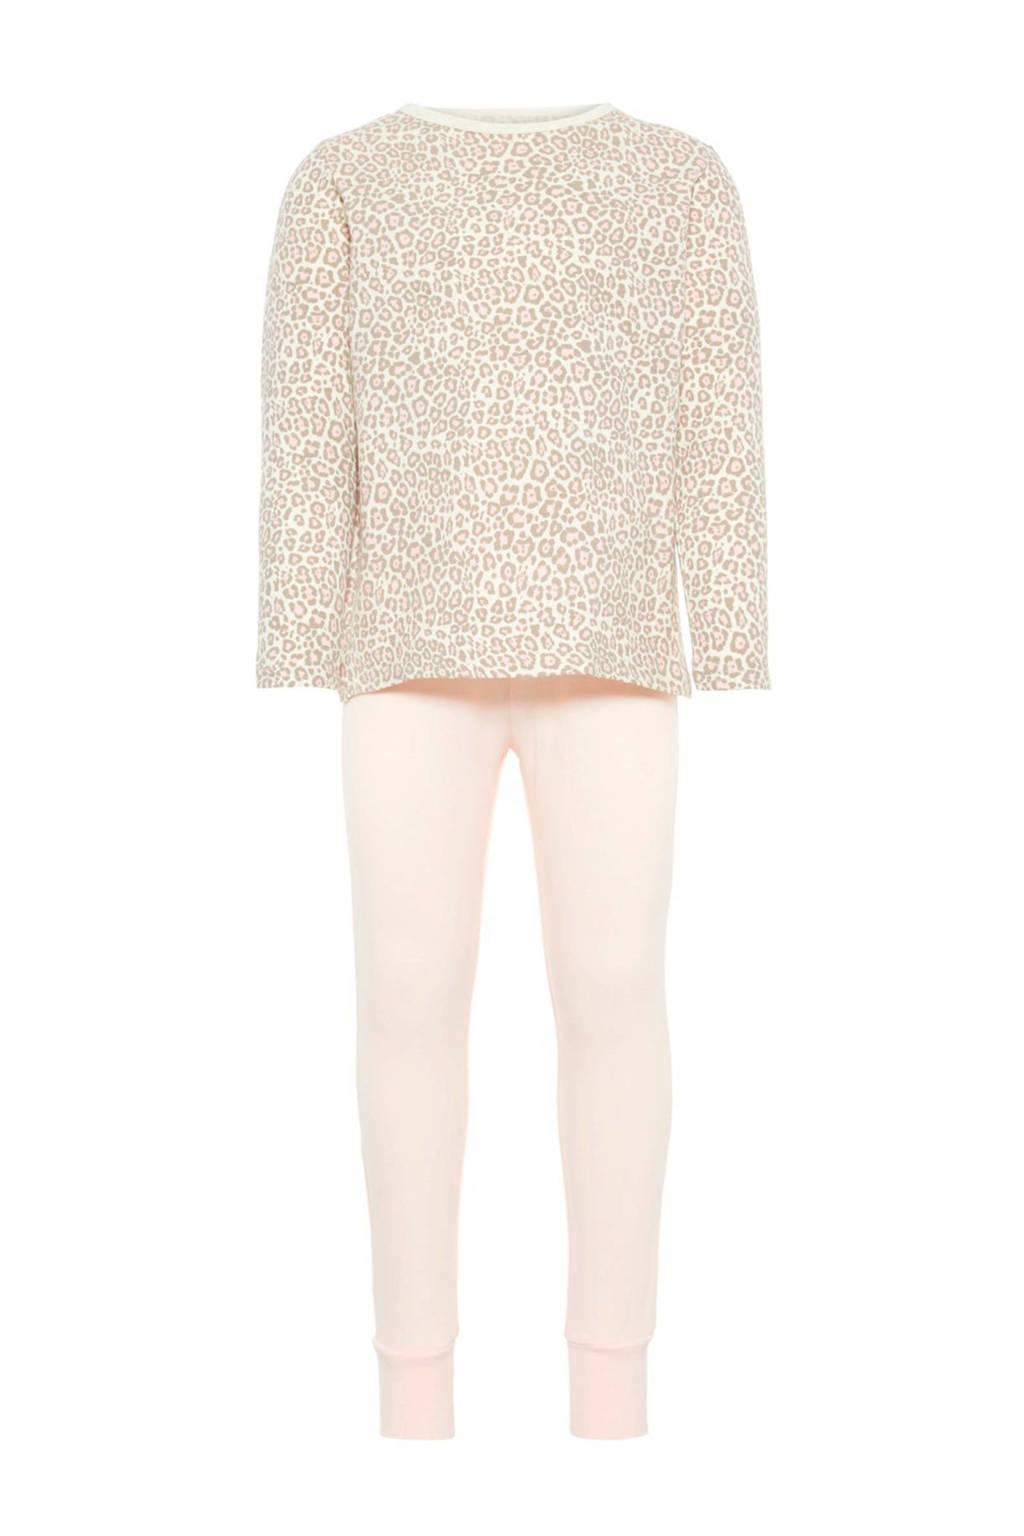 NAME IT MINI pyjama met panterprint, Lichtroze